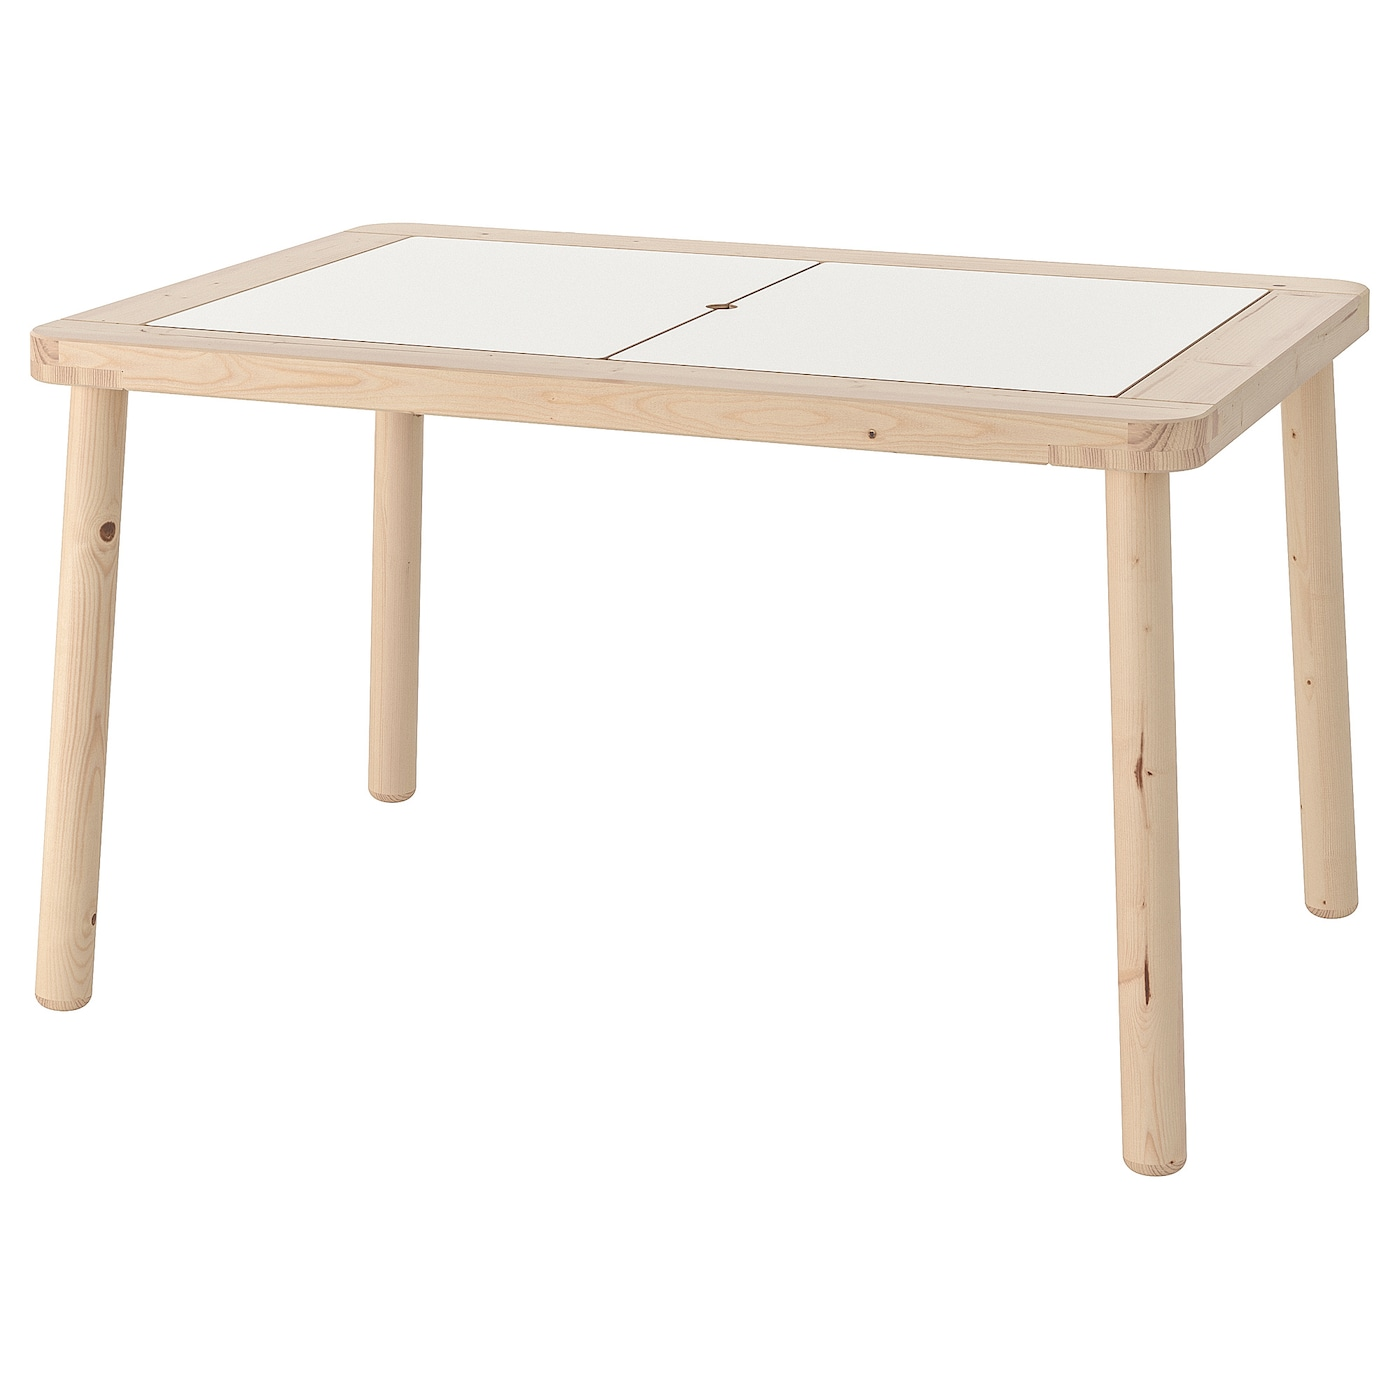 Flisat Children S Table 83x58 Cm Ikea